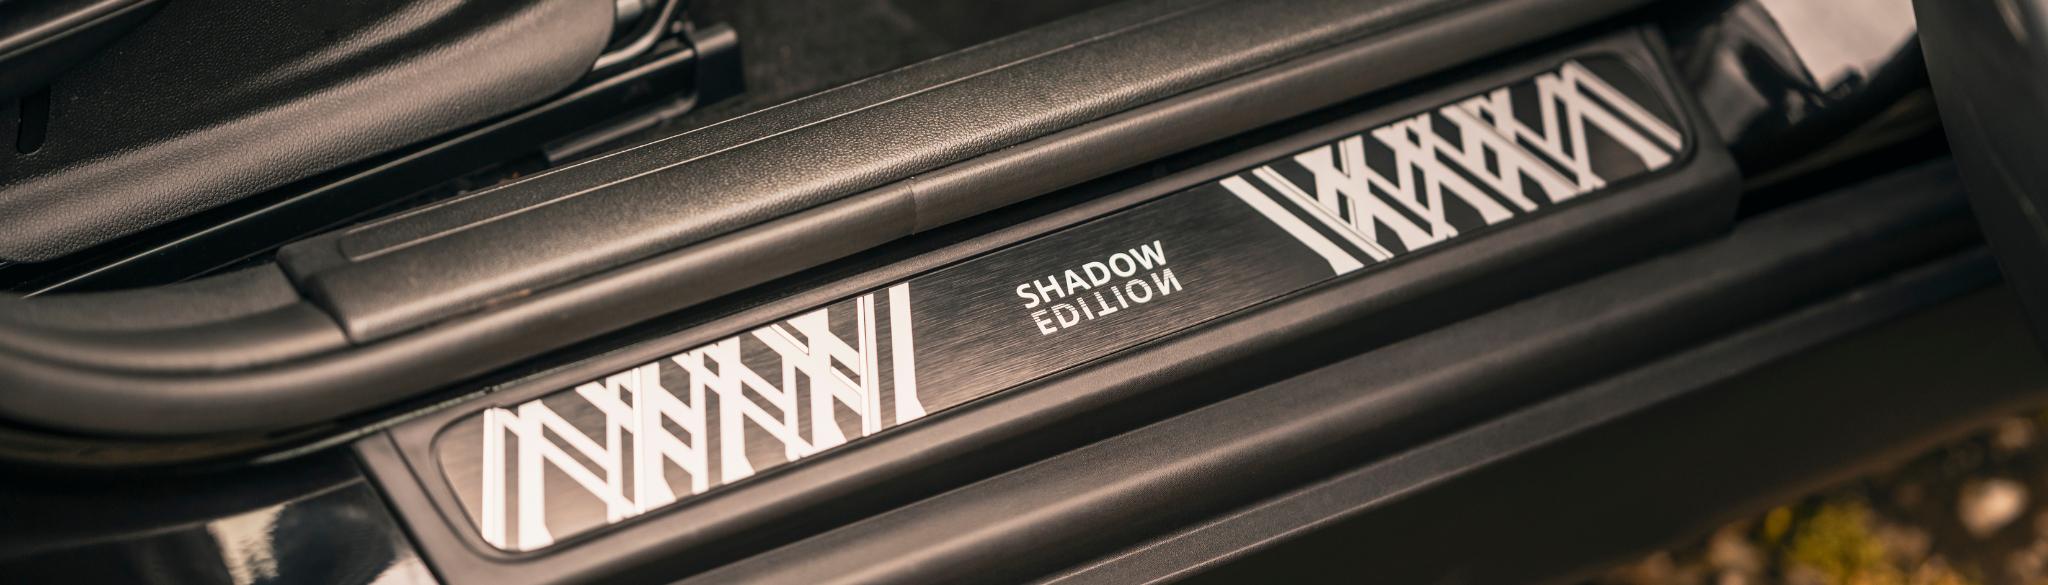 MINI Shadow Edition